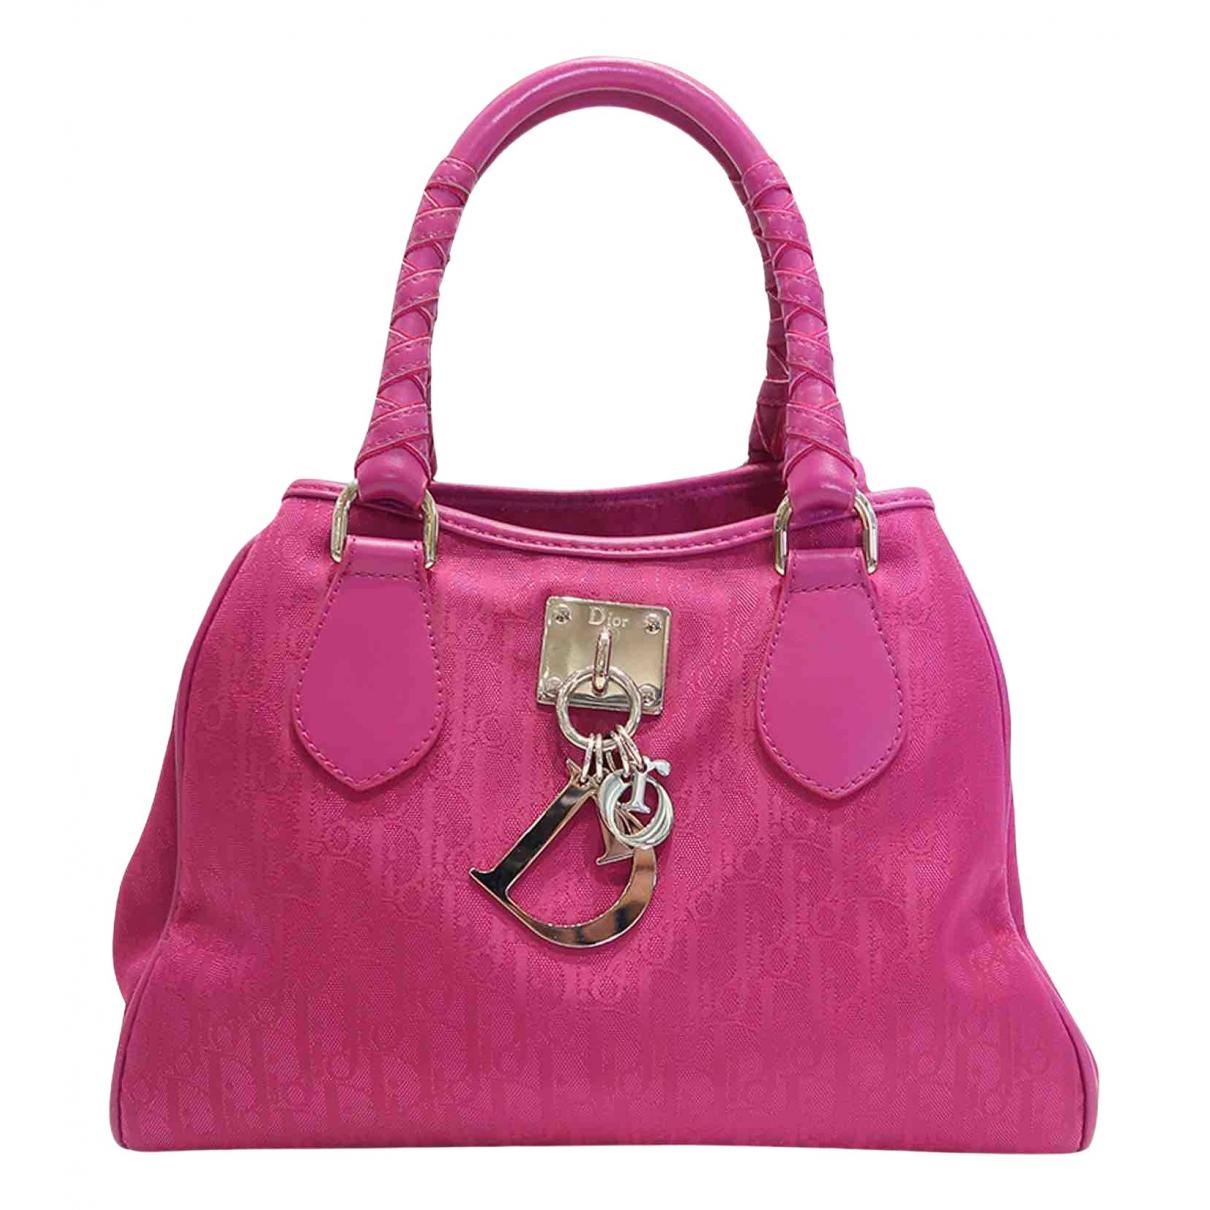 Dior - Sac a main Charming pour femme - violet